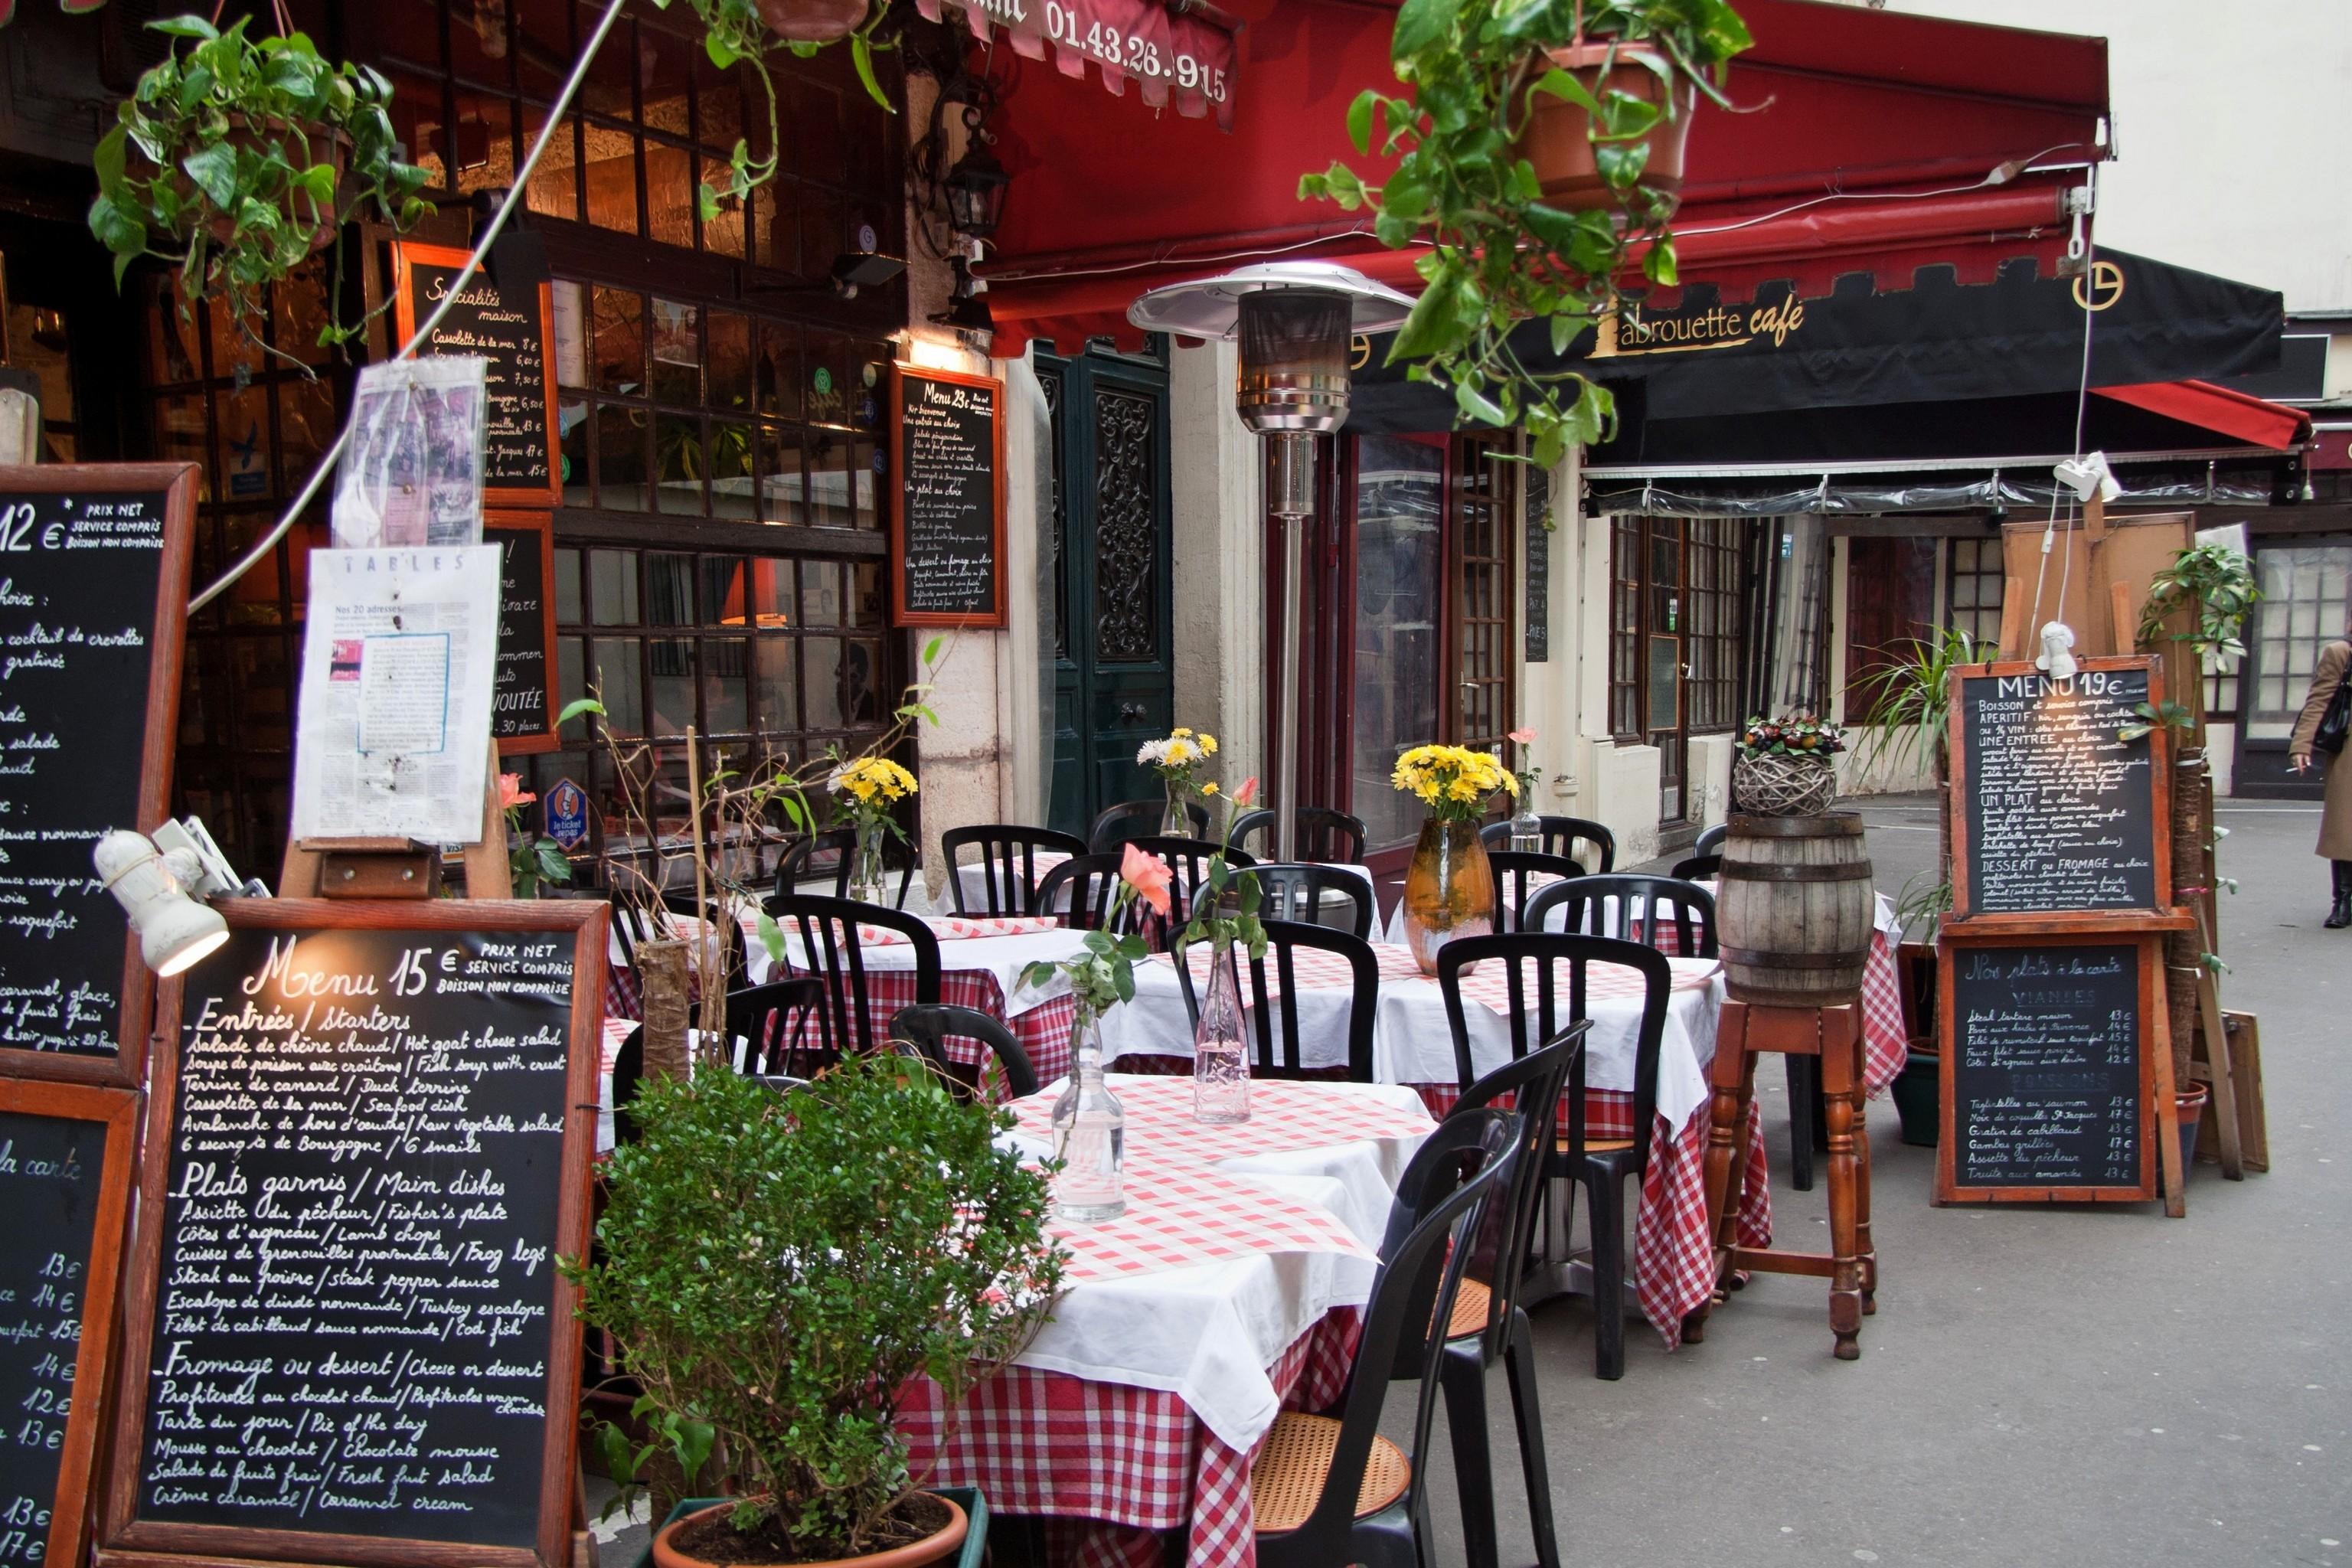 File:Restaurant rue Mouffetard à Paris.jpg - Wikimedia Commons